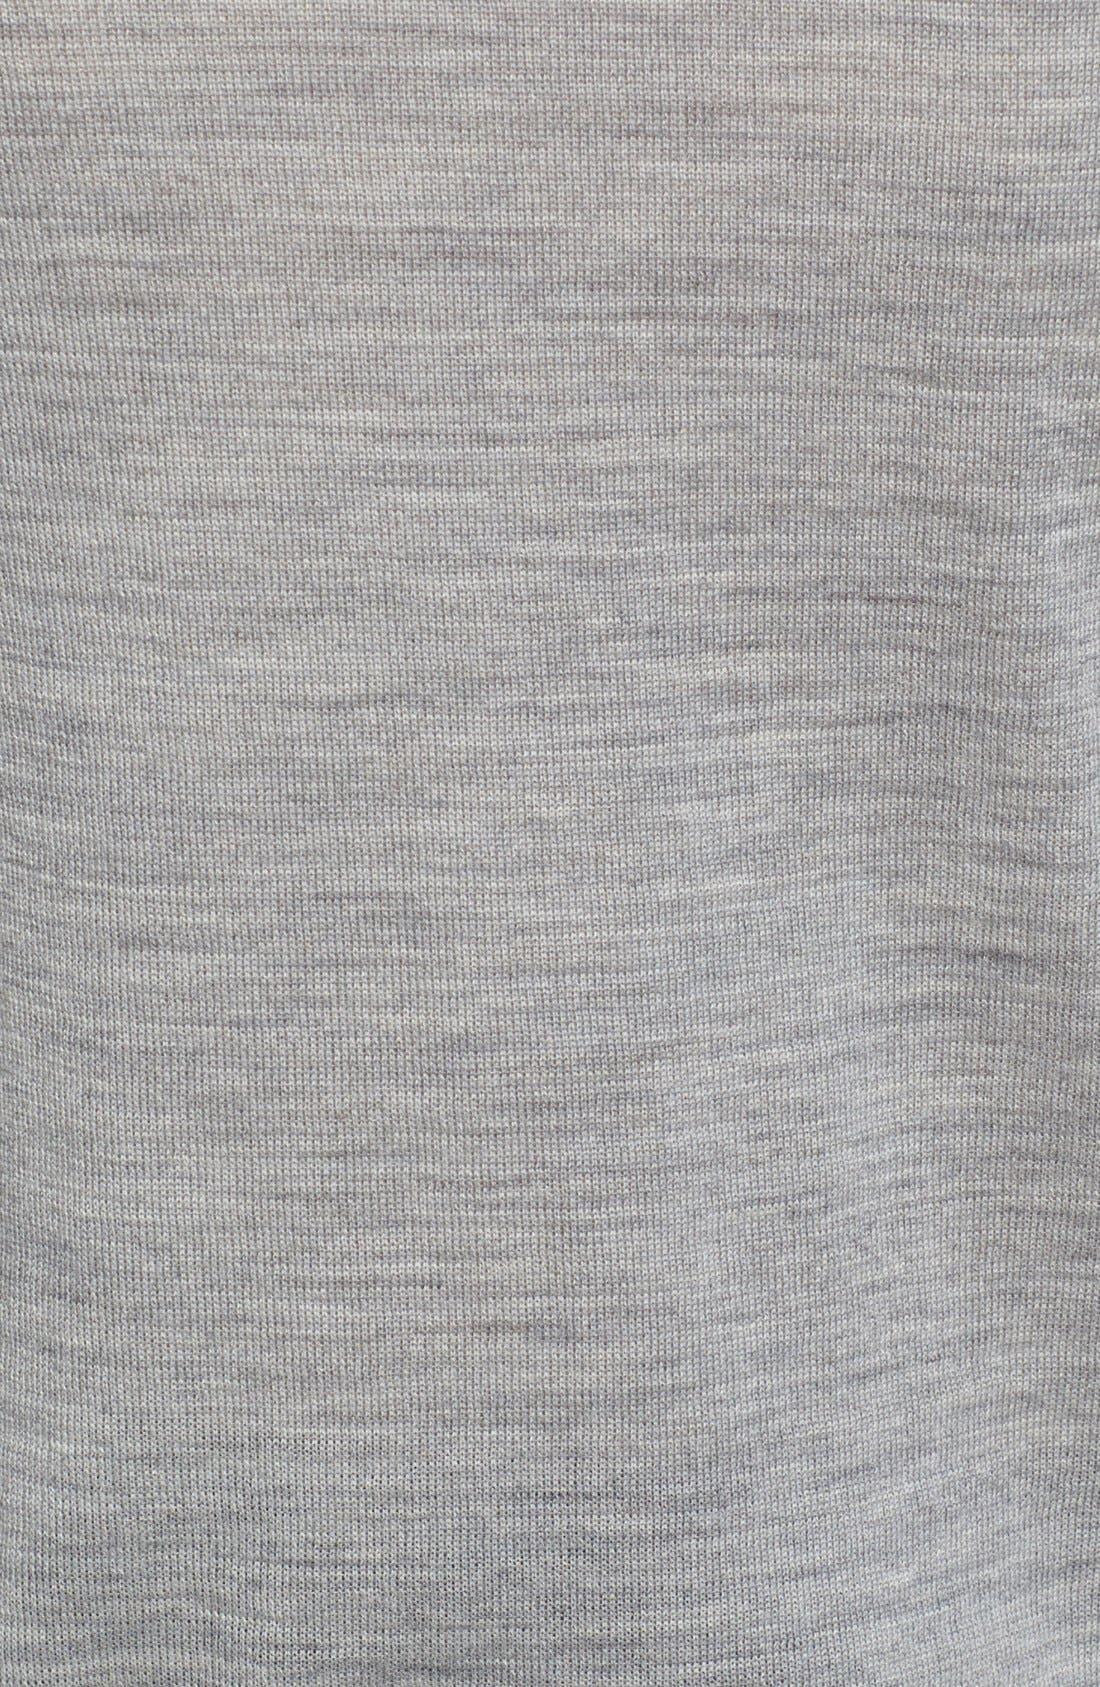 Crewneck Wool Pullover,                             Alternate thumbnail 4, color,                             020